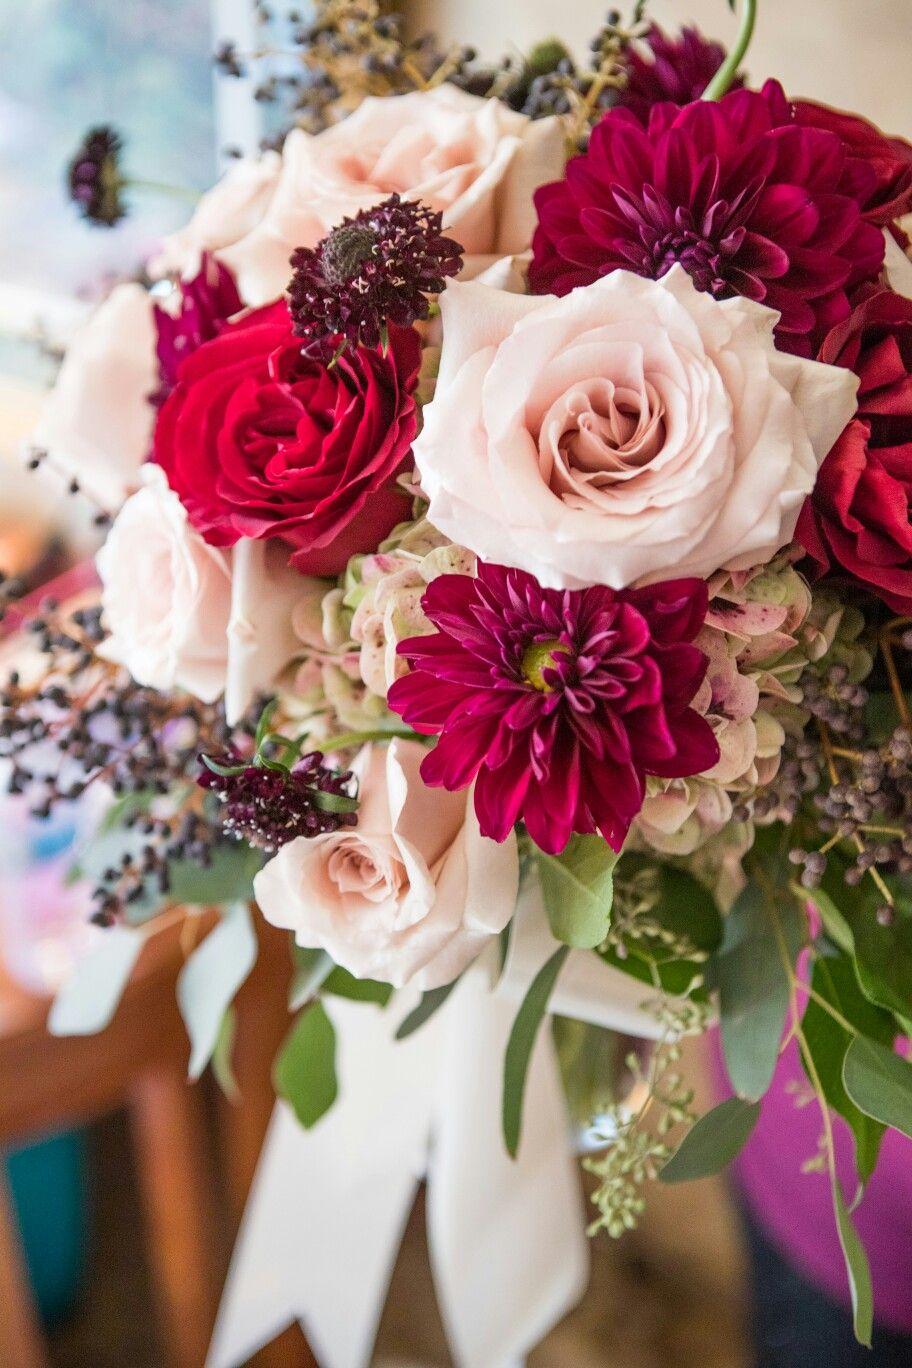 Glitter Flower Bouquets Choice Image - Flower Wallpaper HD